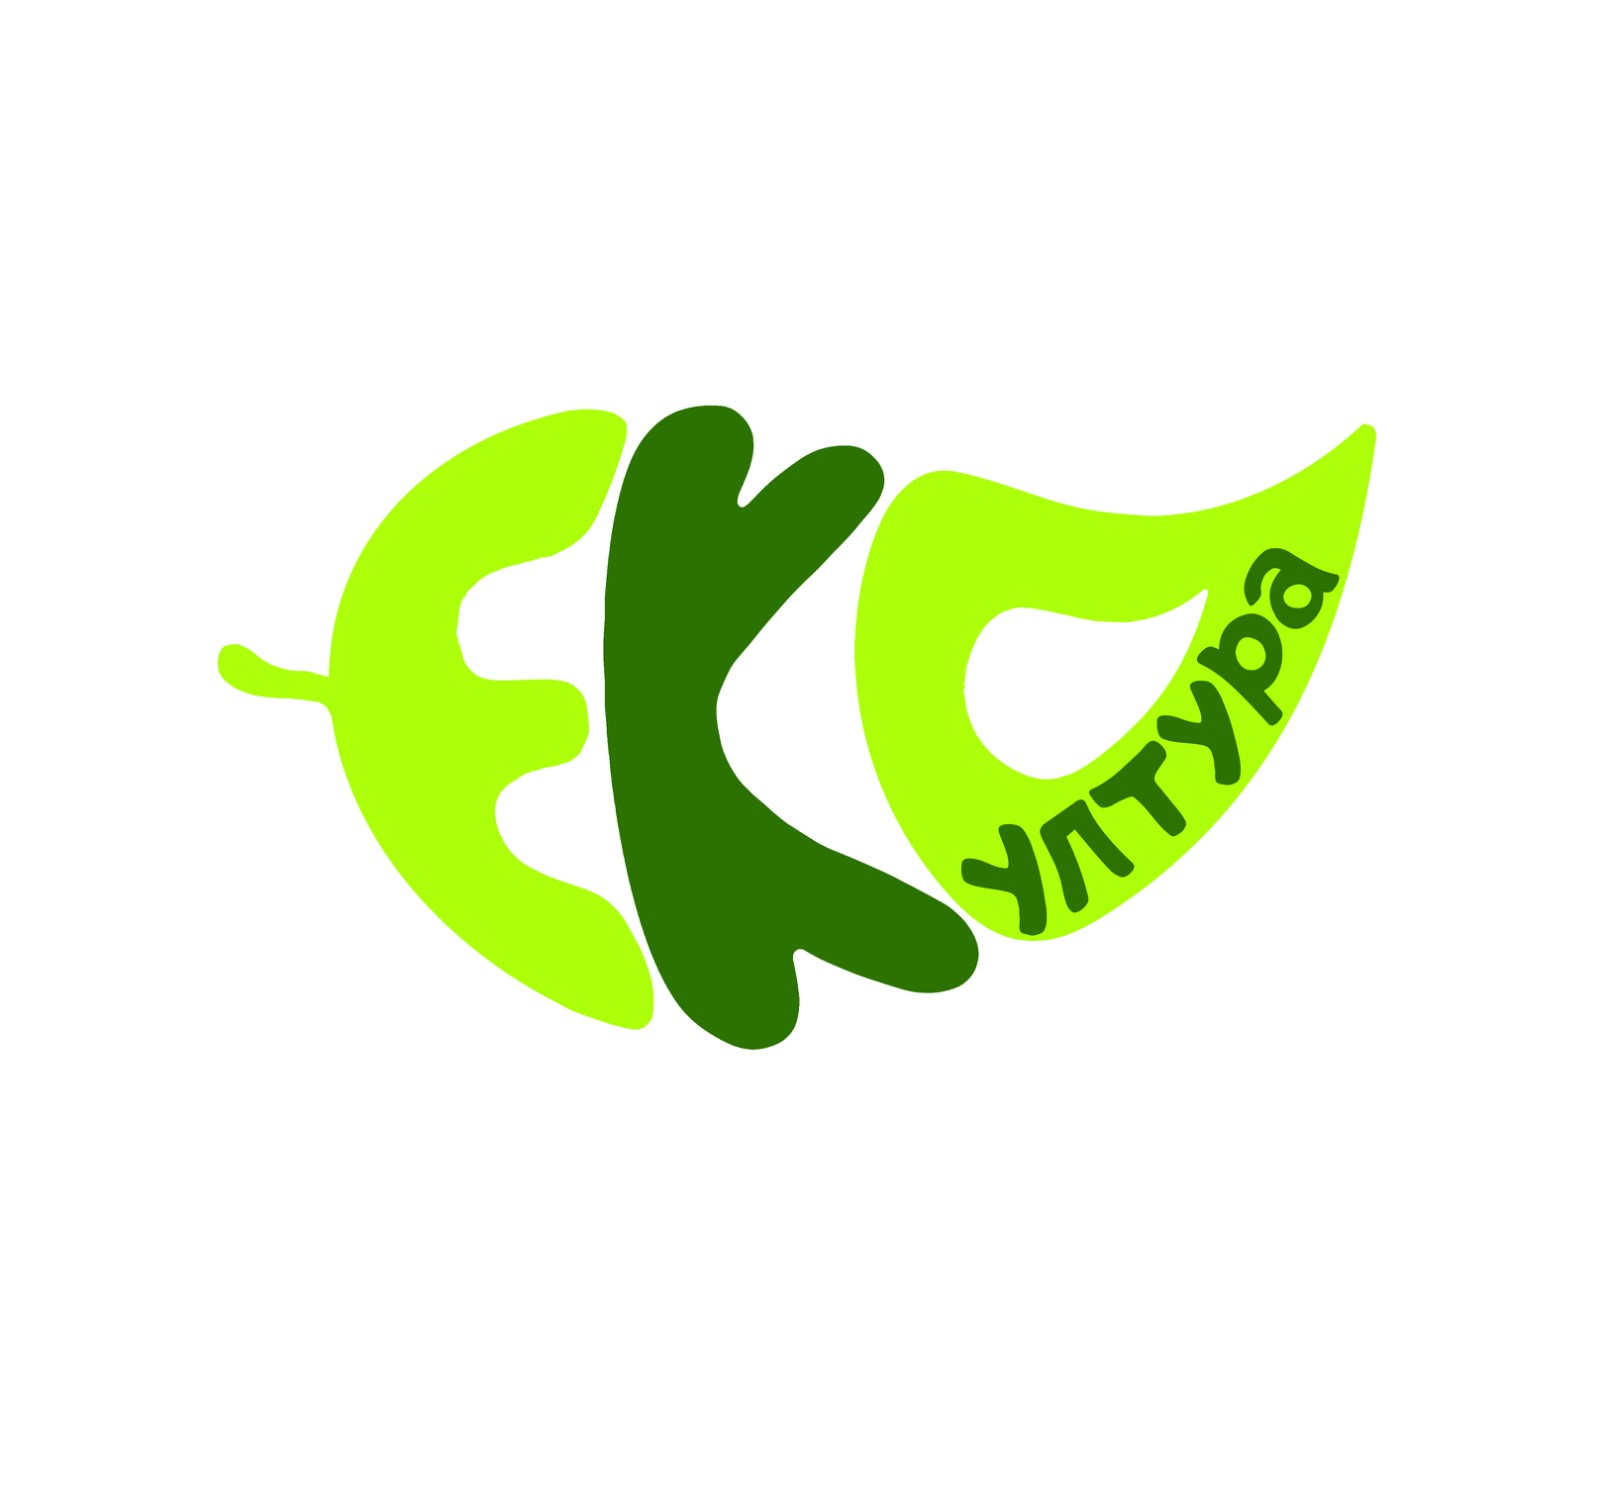 Ecoculture logo new